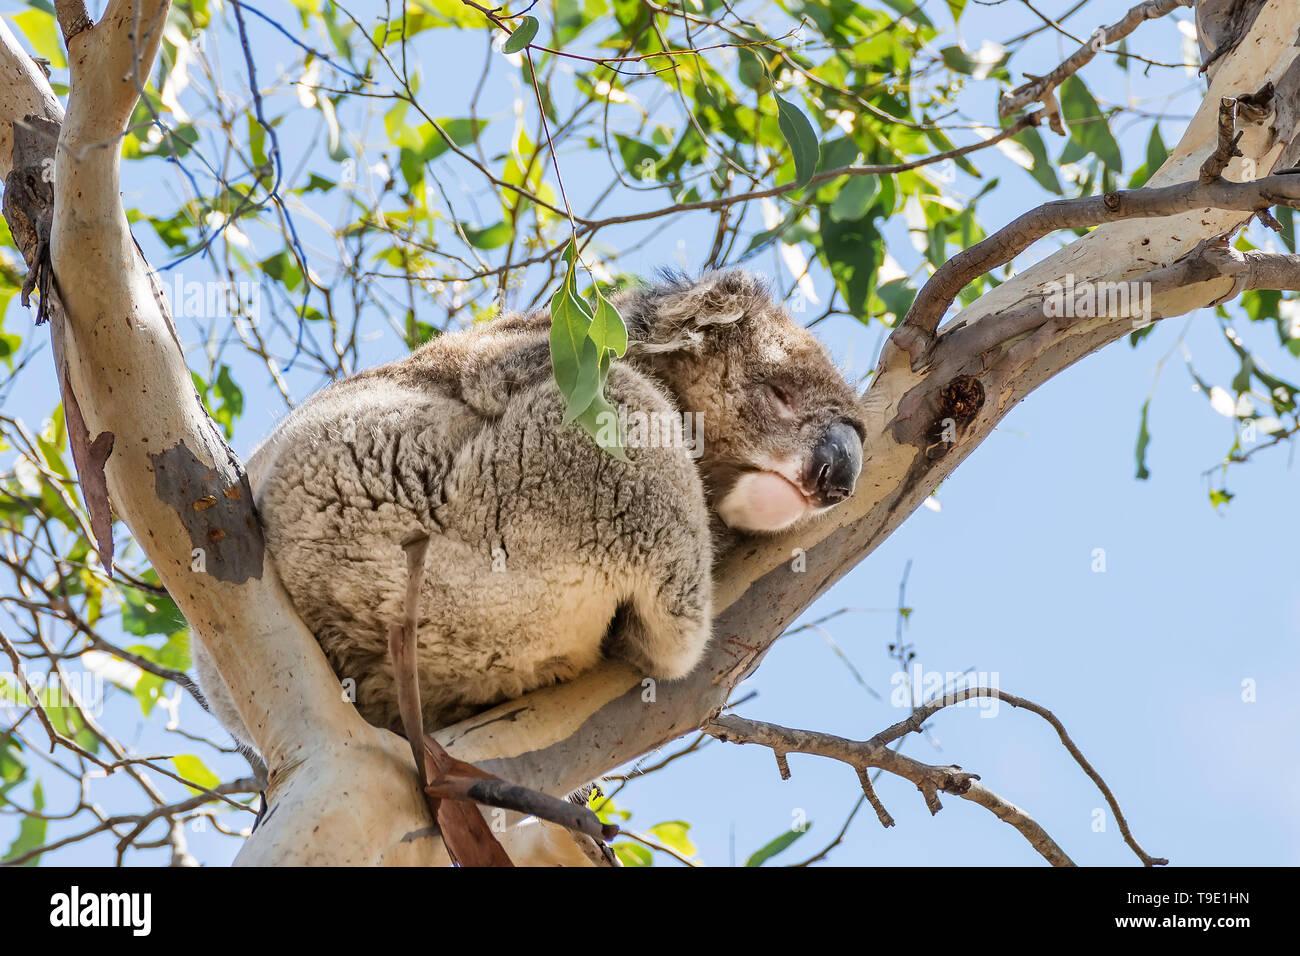 Beautiful koala in wild life sleeping leaning against a high eucalyptus branch against the blue sky, Kangaroo Island, Southern Australia Stock Photo